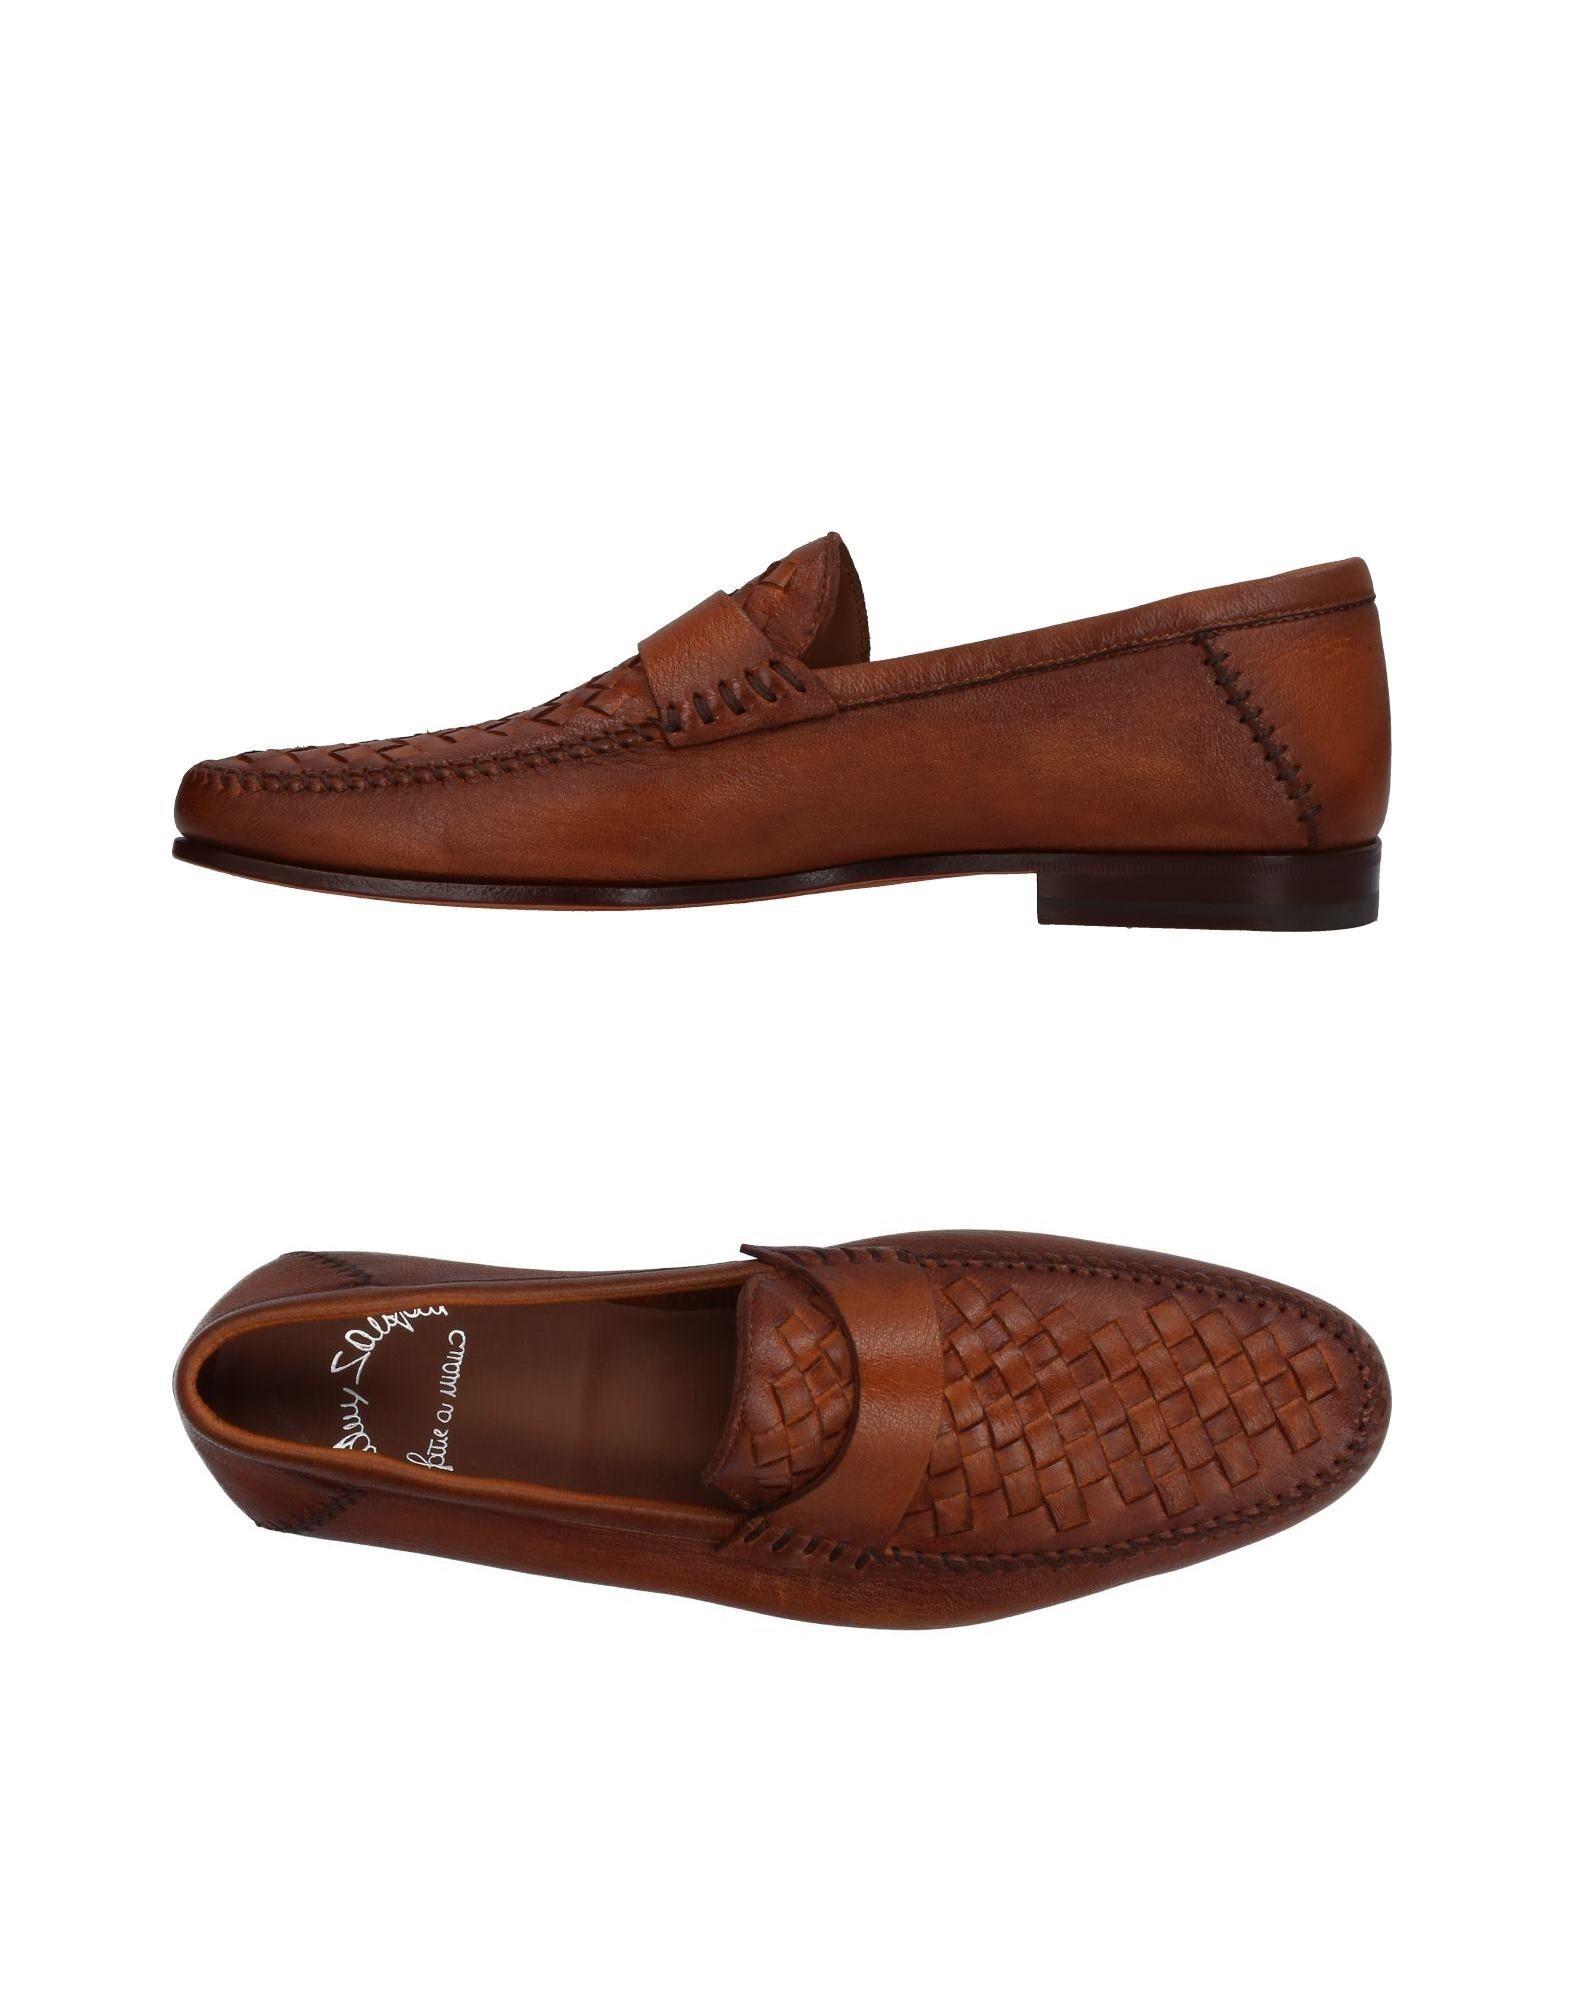 Santoni Mokassins Herren  11409975VA Gute Qualität beliebte Schuhe